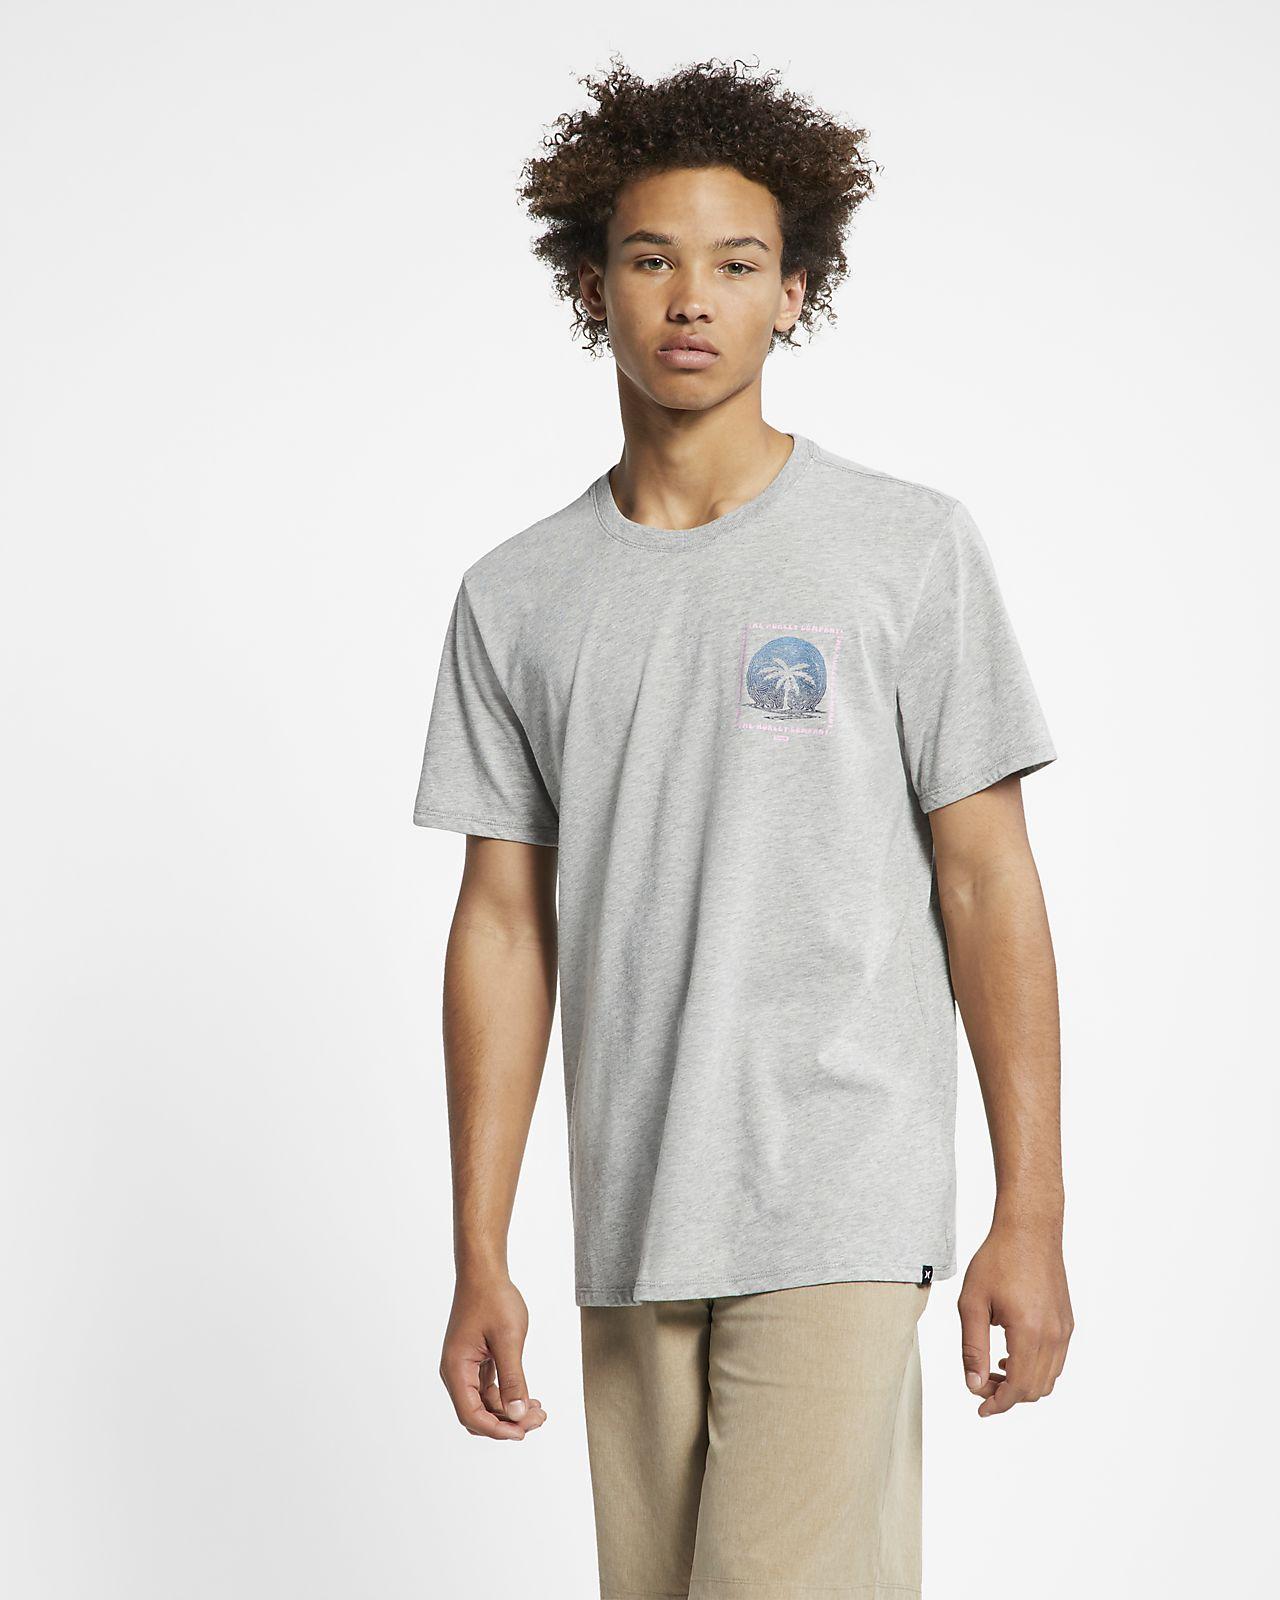 Pánské tričko Hurley Dri-FIT Trippy Palms